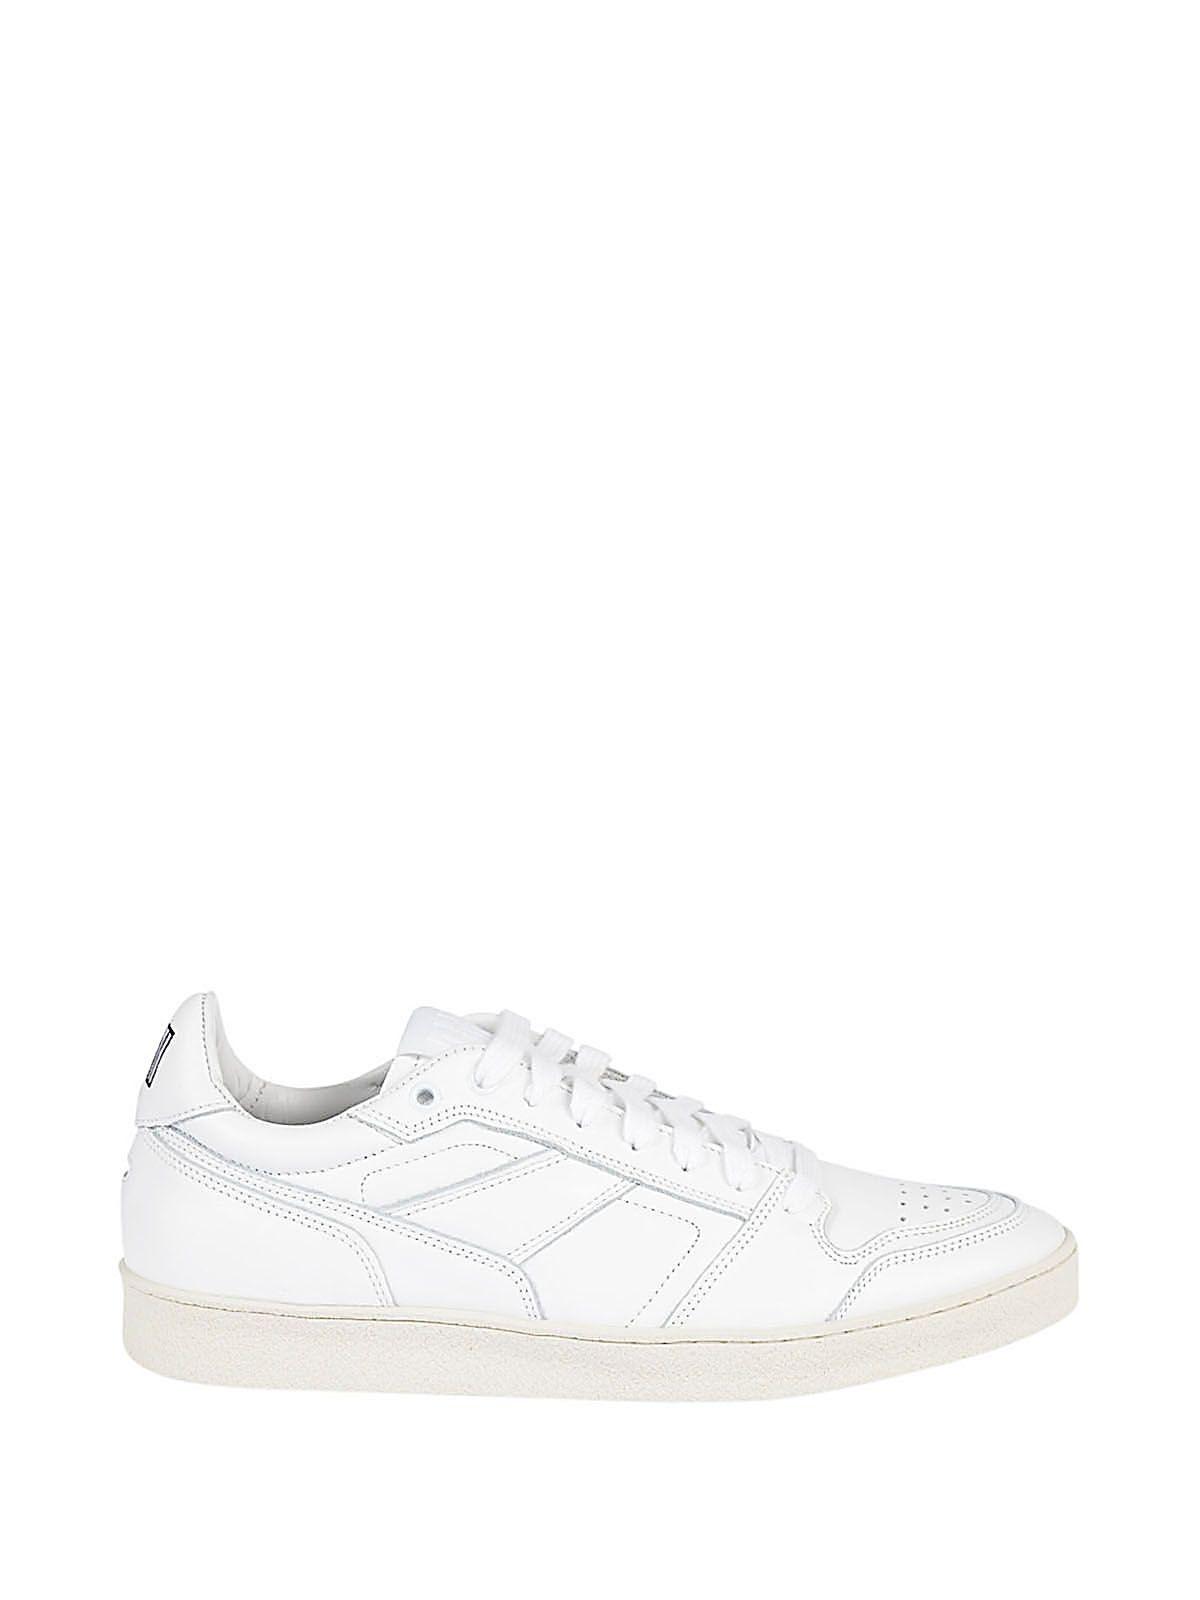 Ami Alexandre Mattiussi Low-top Sneakers